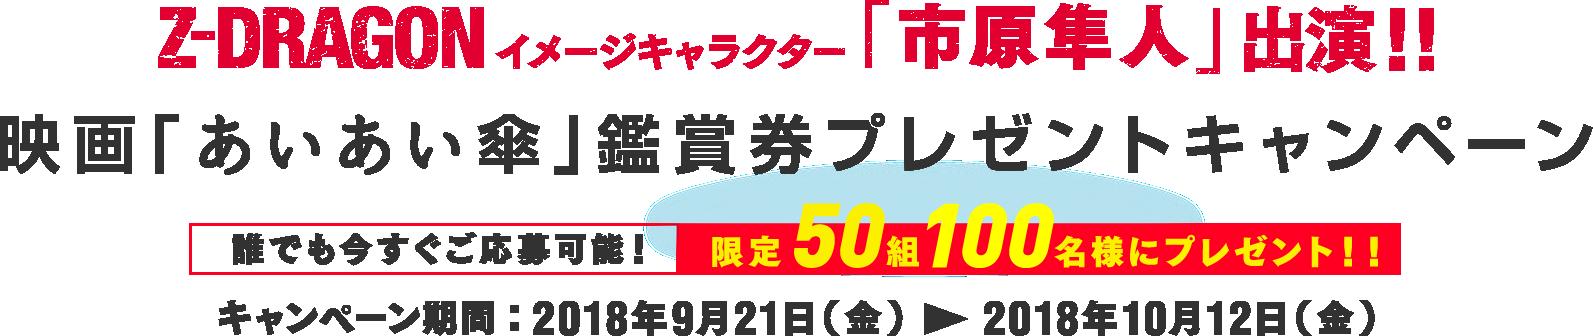 Z-DRAGONイメージキャラクター市原隼人出演!映画『あいあい傘』鑑賞券プレゼントキャンペーン 50組100名様にプレゼント!